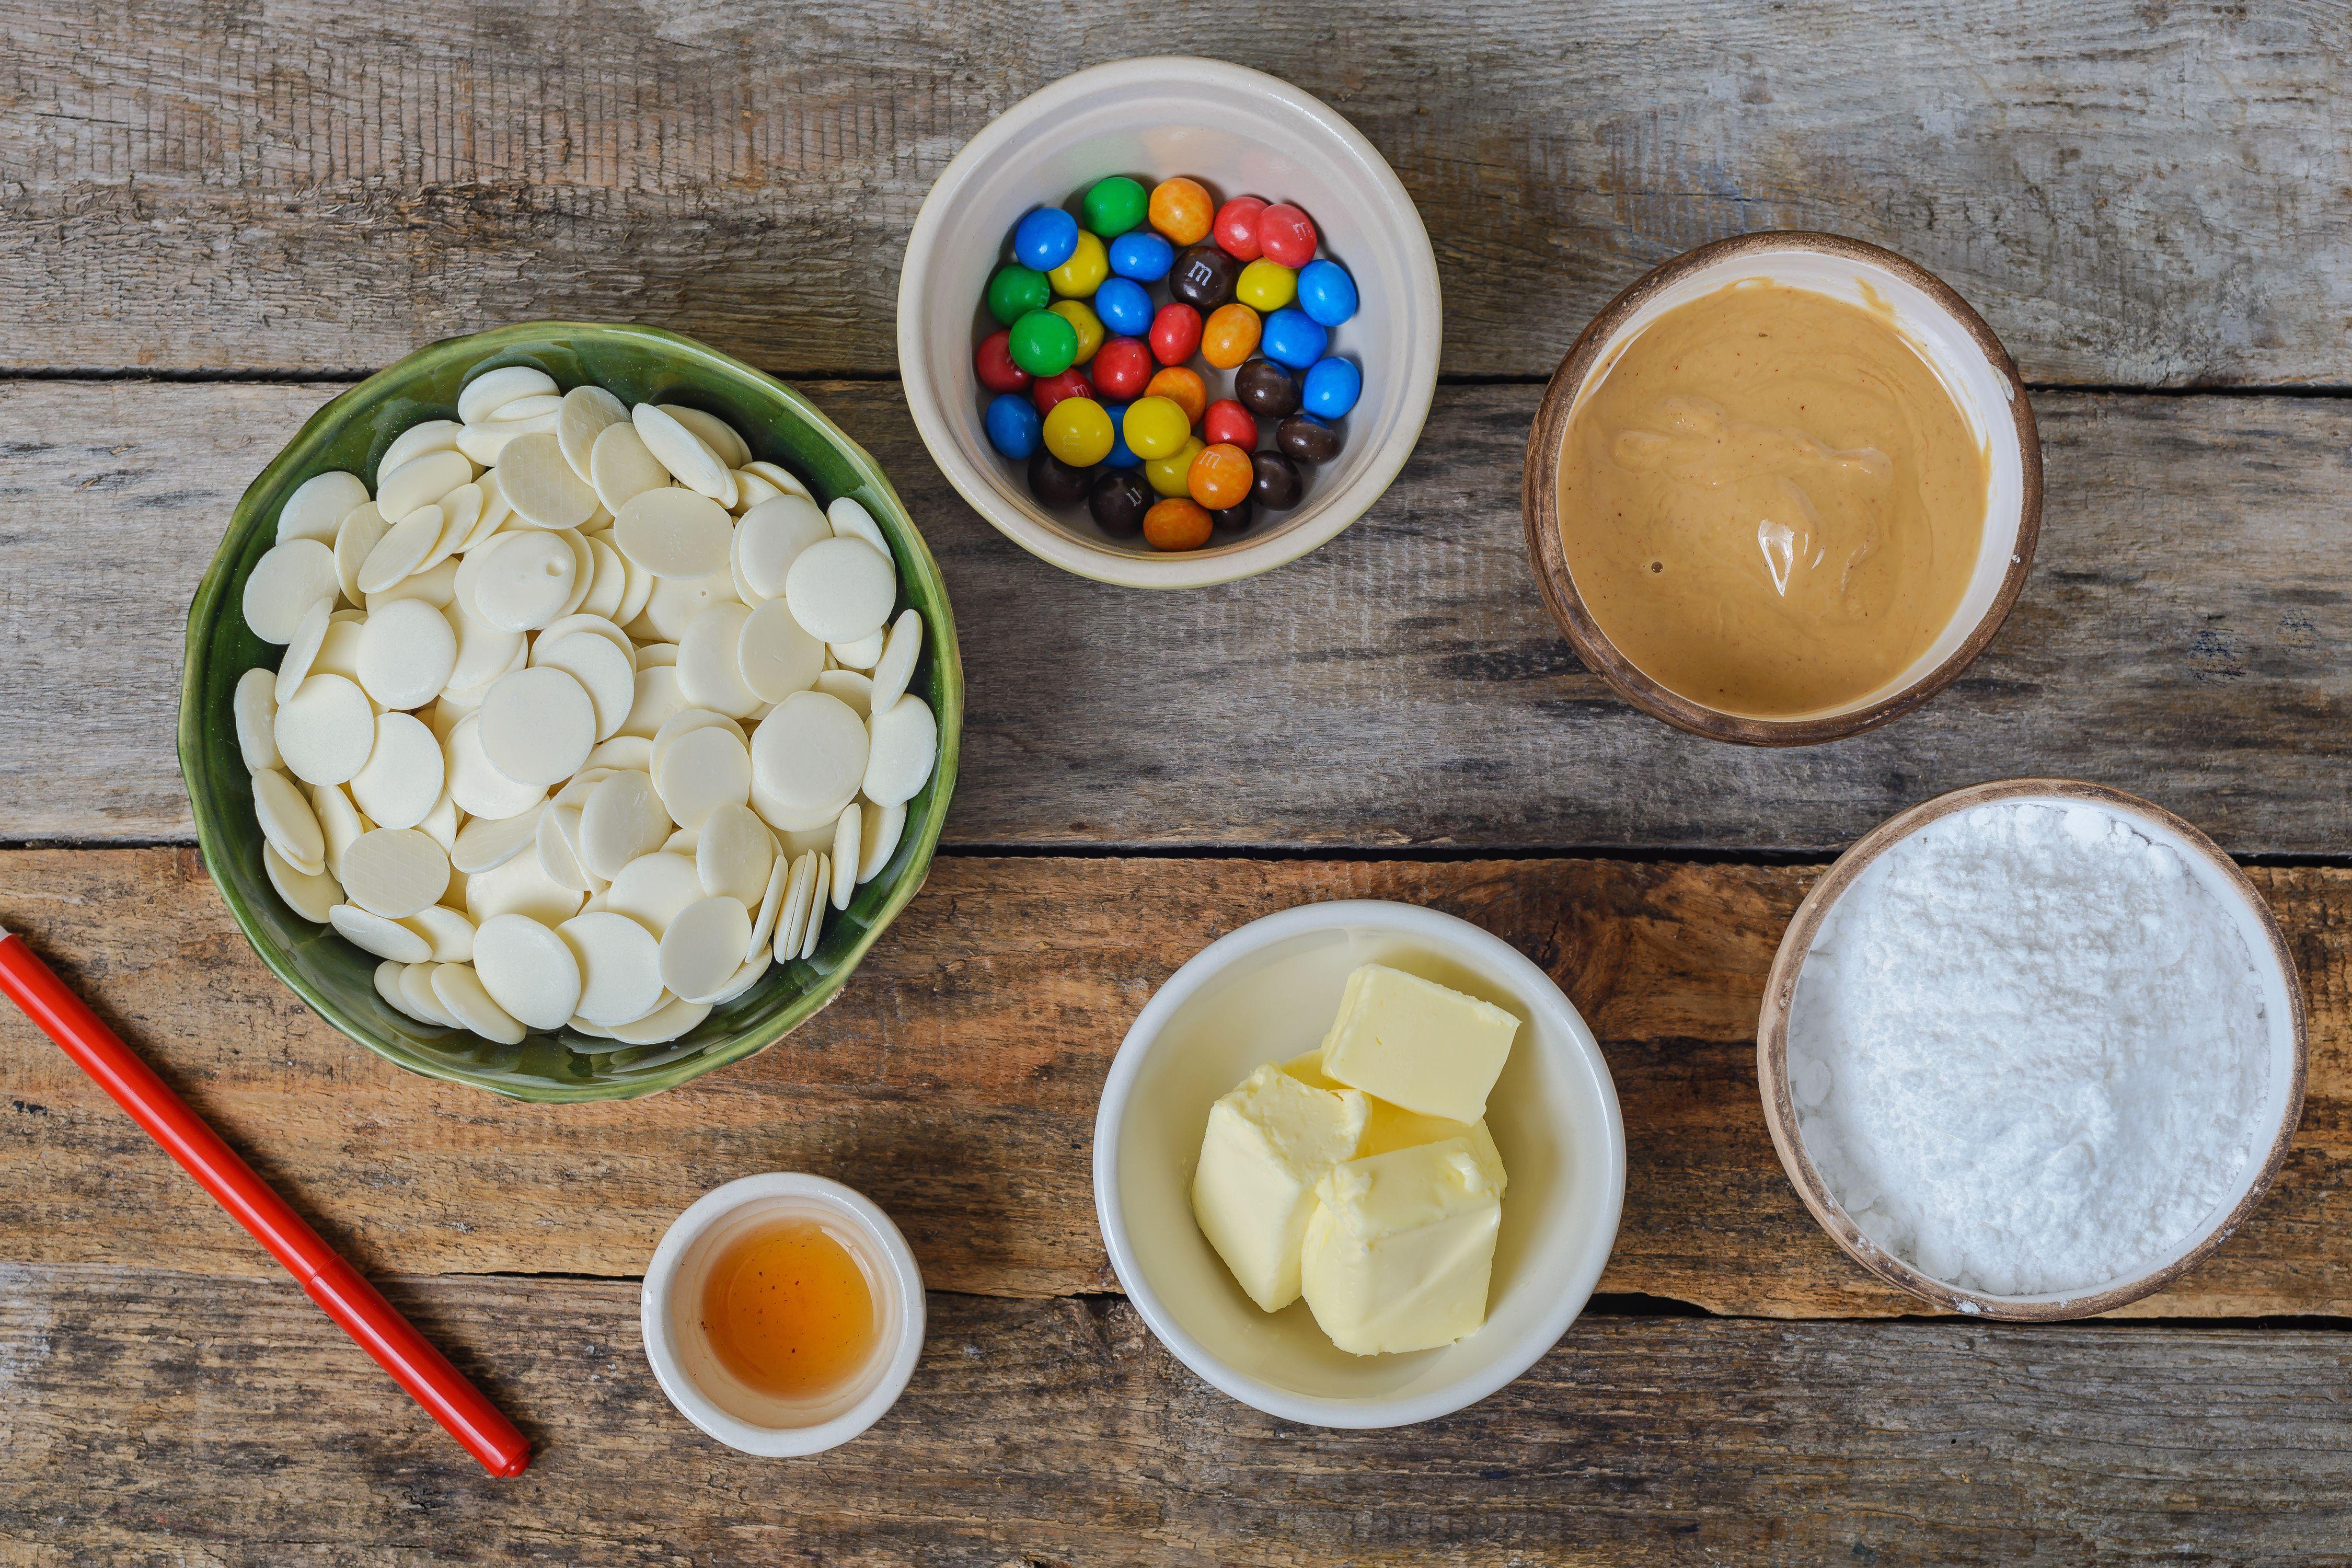 Ingredients for peanut butter eyeballs